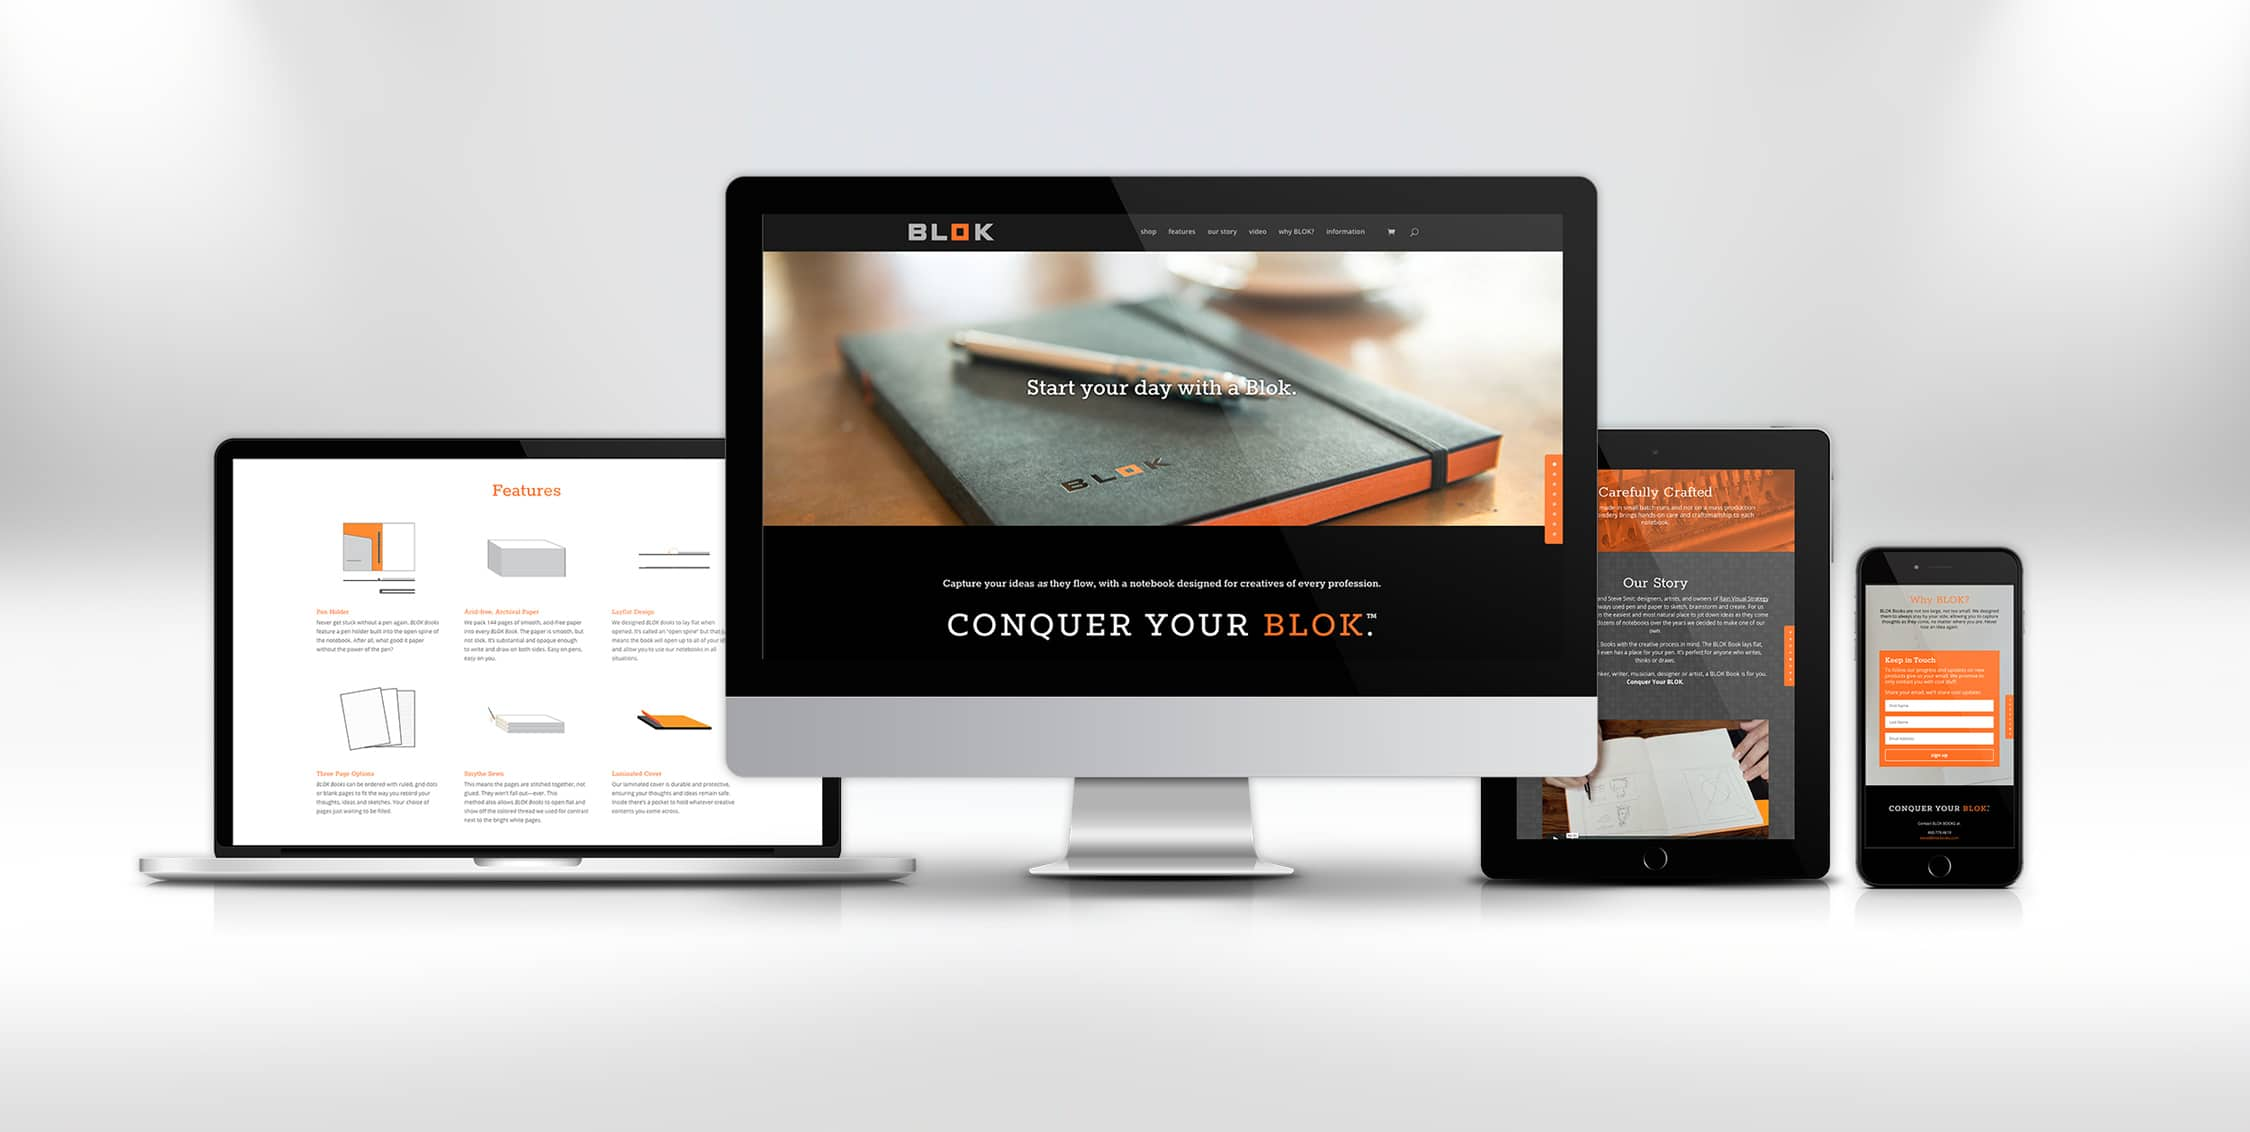 blok books website